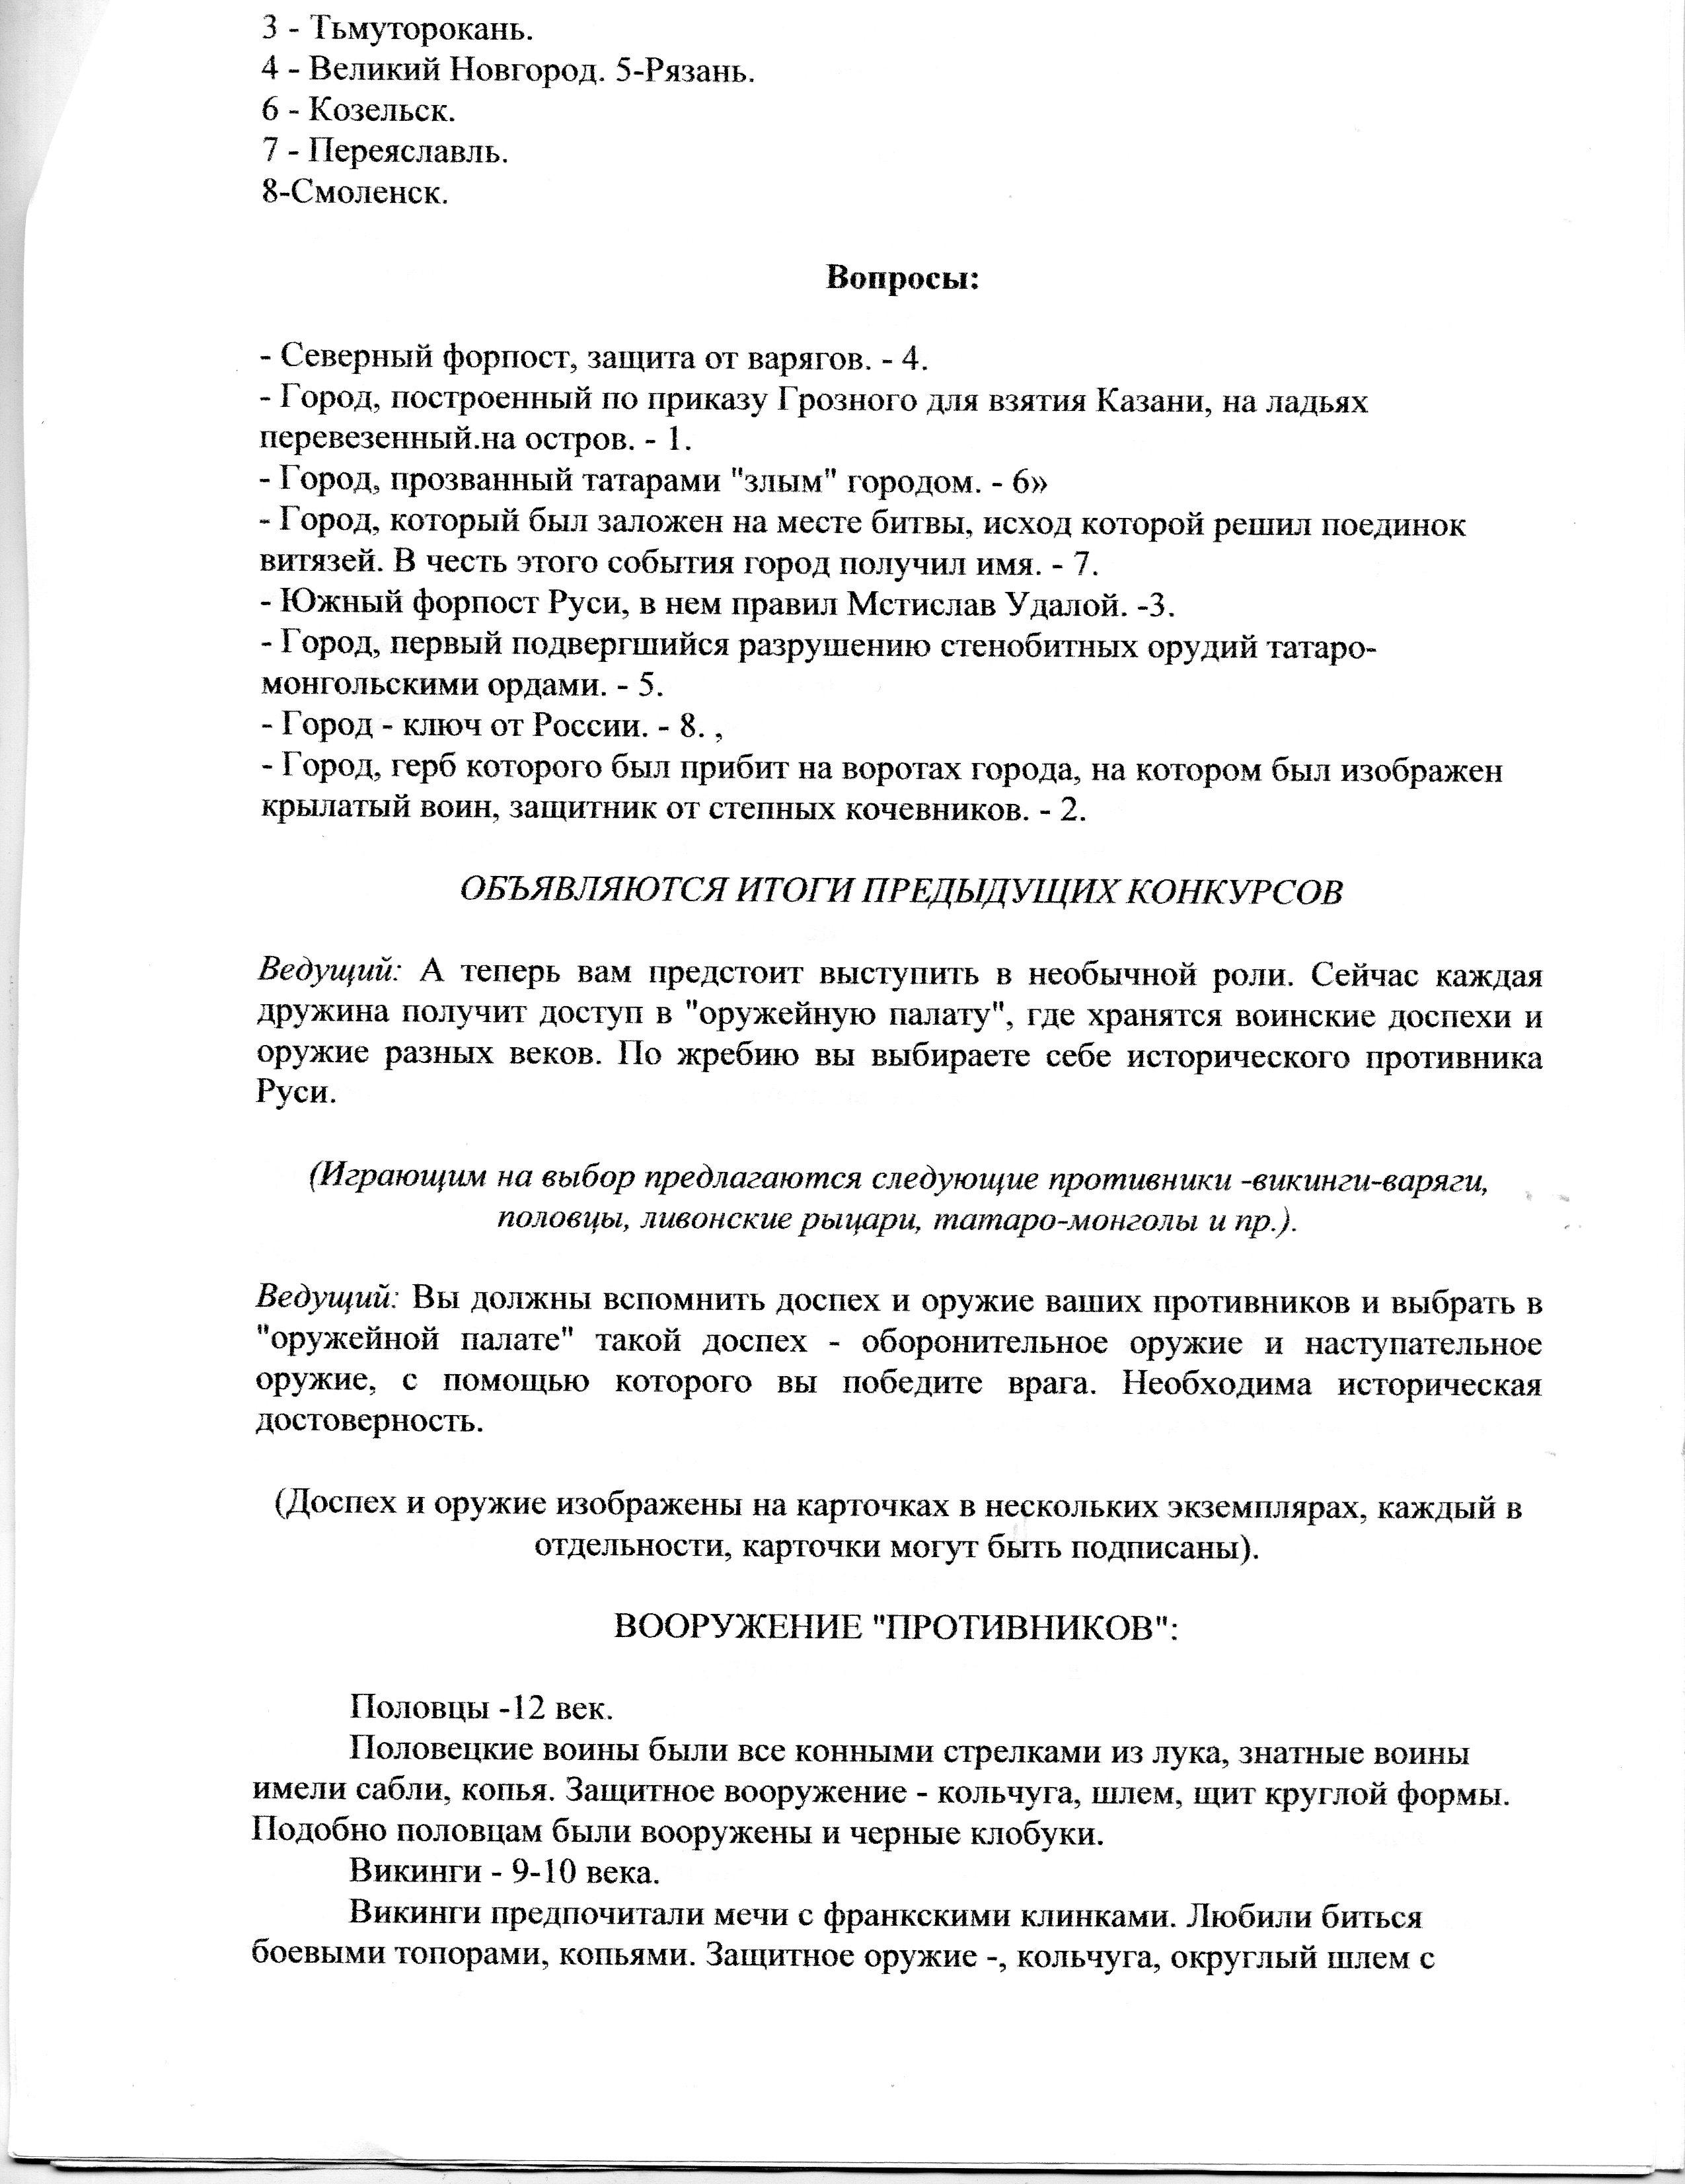 C:\Users\Ульяна\Pictures\скан477.jpg